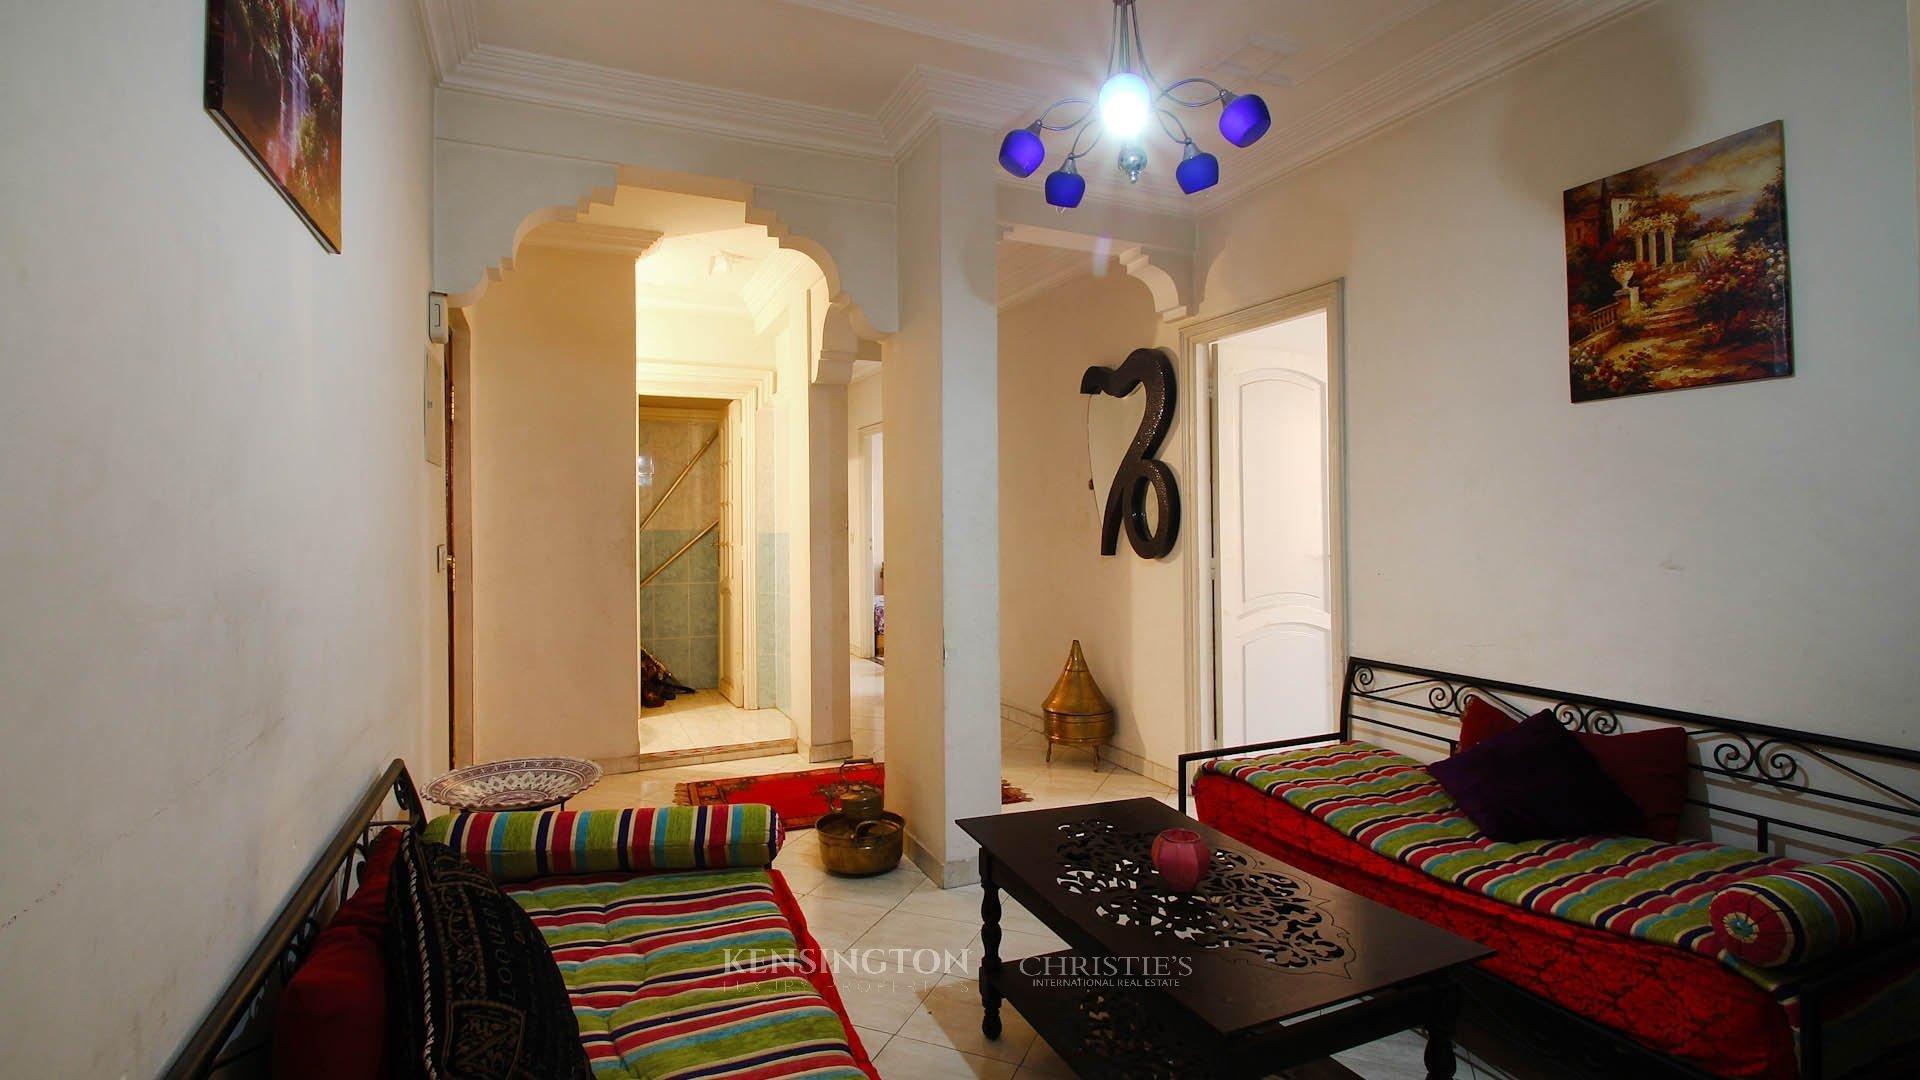 KPPM01149: Apartment Maha Apartment Marrakech Morocco